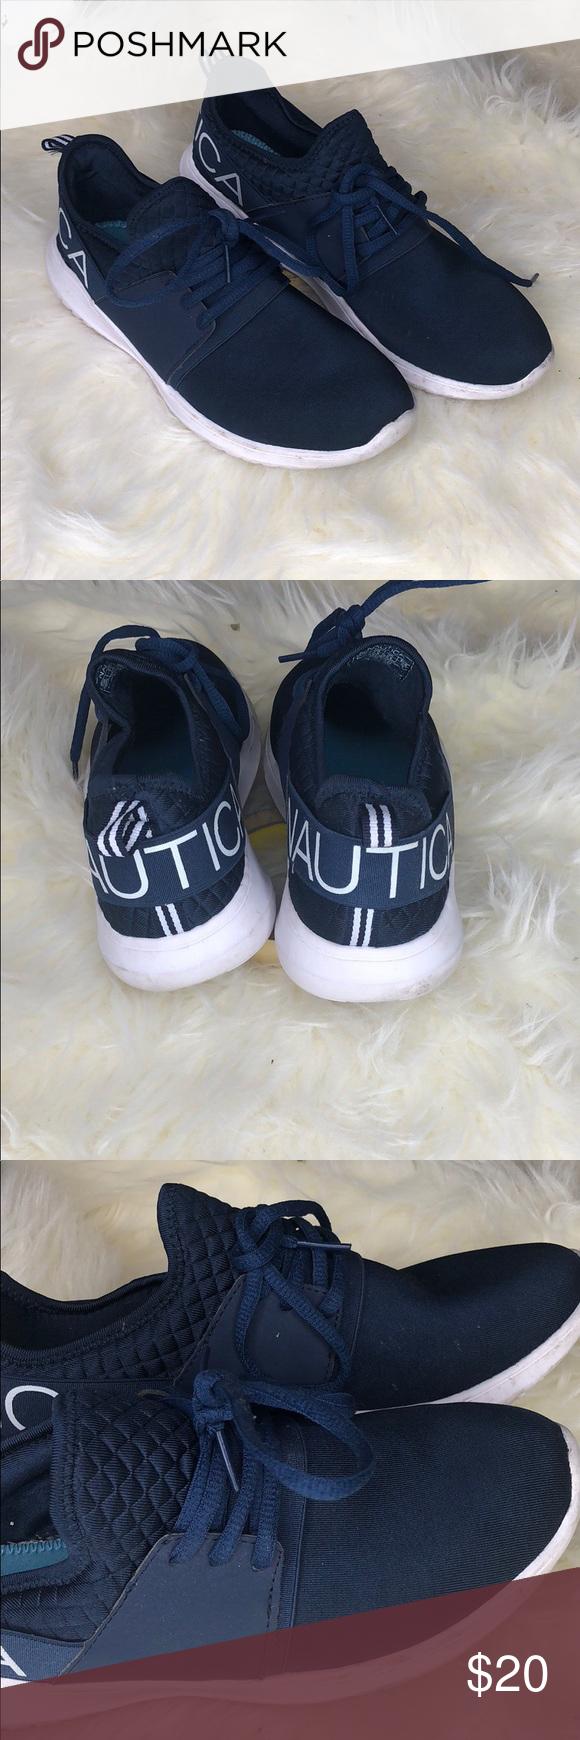 Nautica Navy Blue Tennis Shoes 👟   Navy